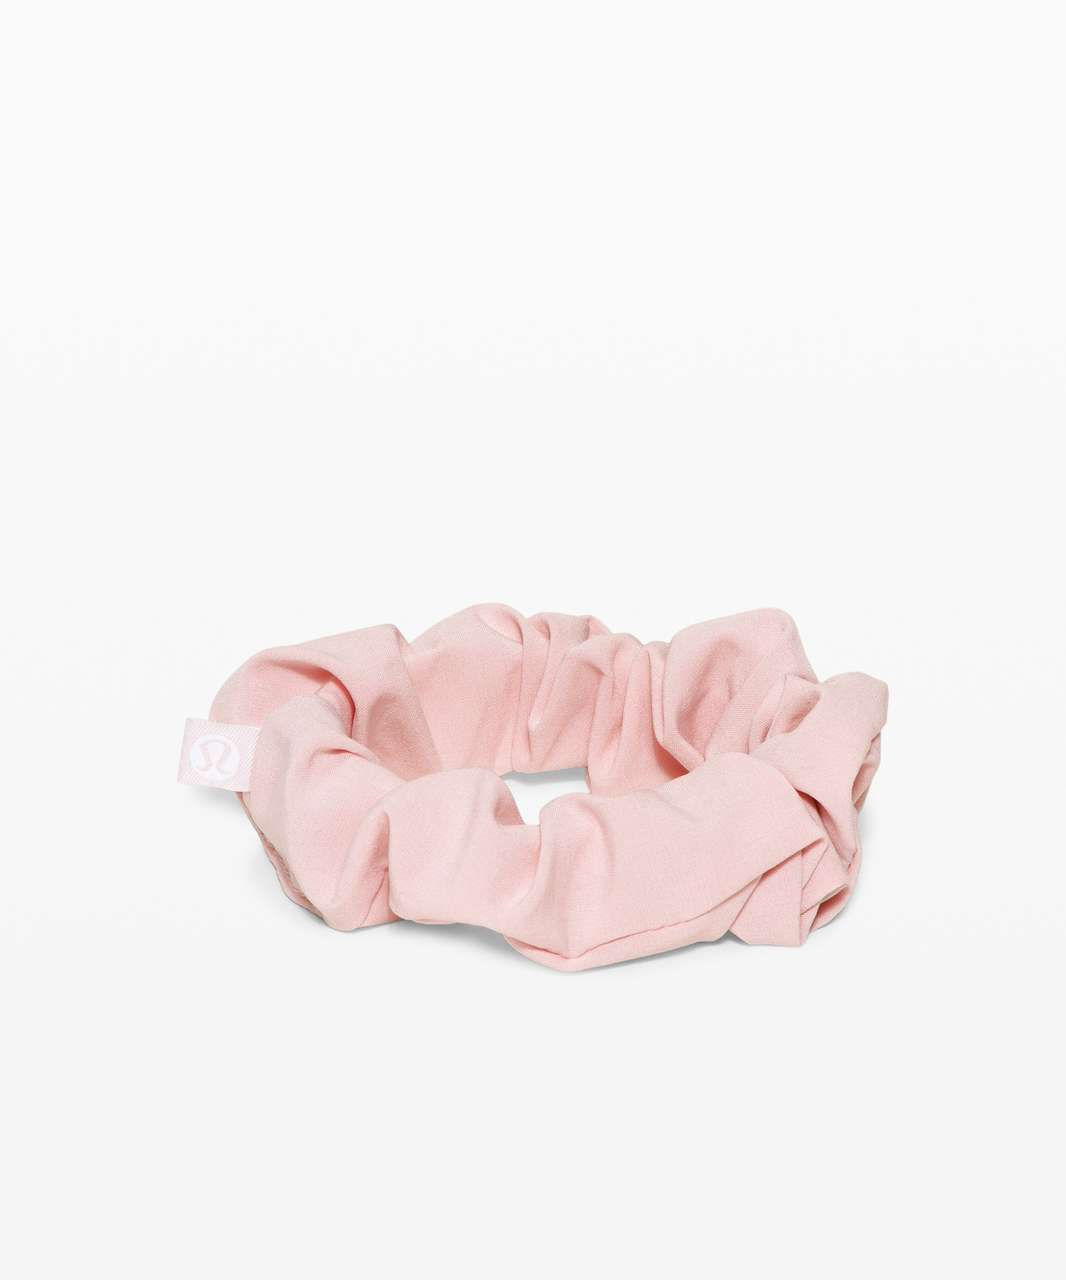 Lululemon Uplifting Scrunchie - Misty Pink